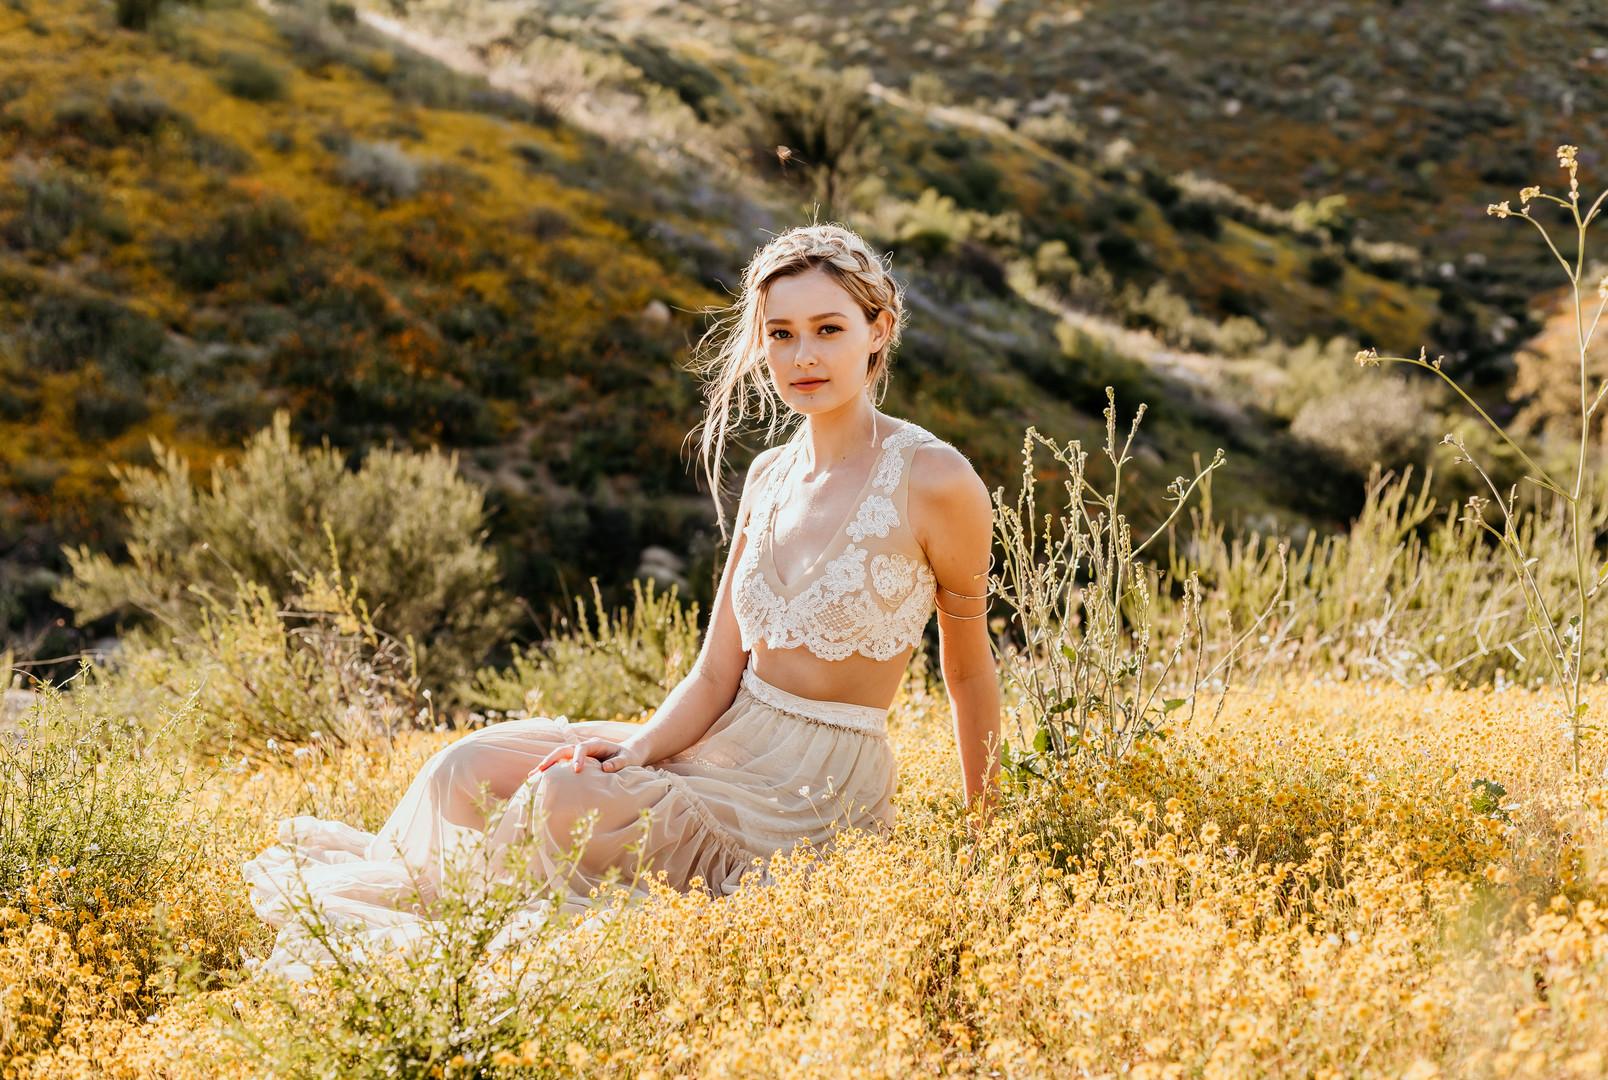 MelissaFeChapmanPhotography_PoppyfieldsbridalsessionwithBrookebyMelissaFeChapmanPhotography32819137_big.jpg